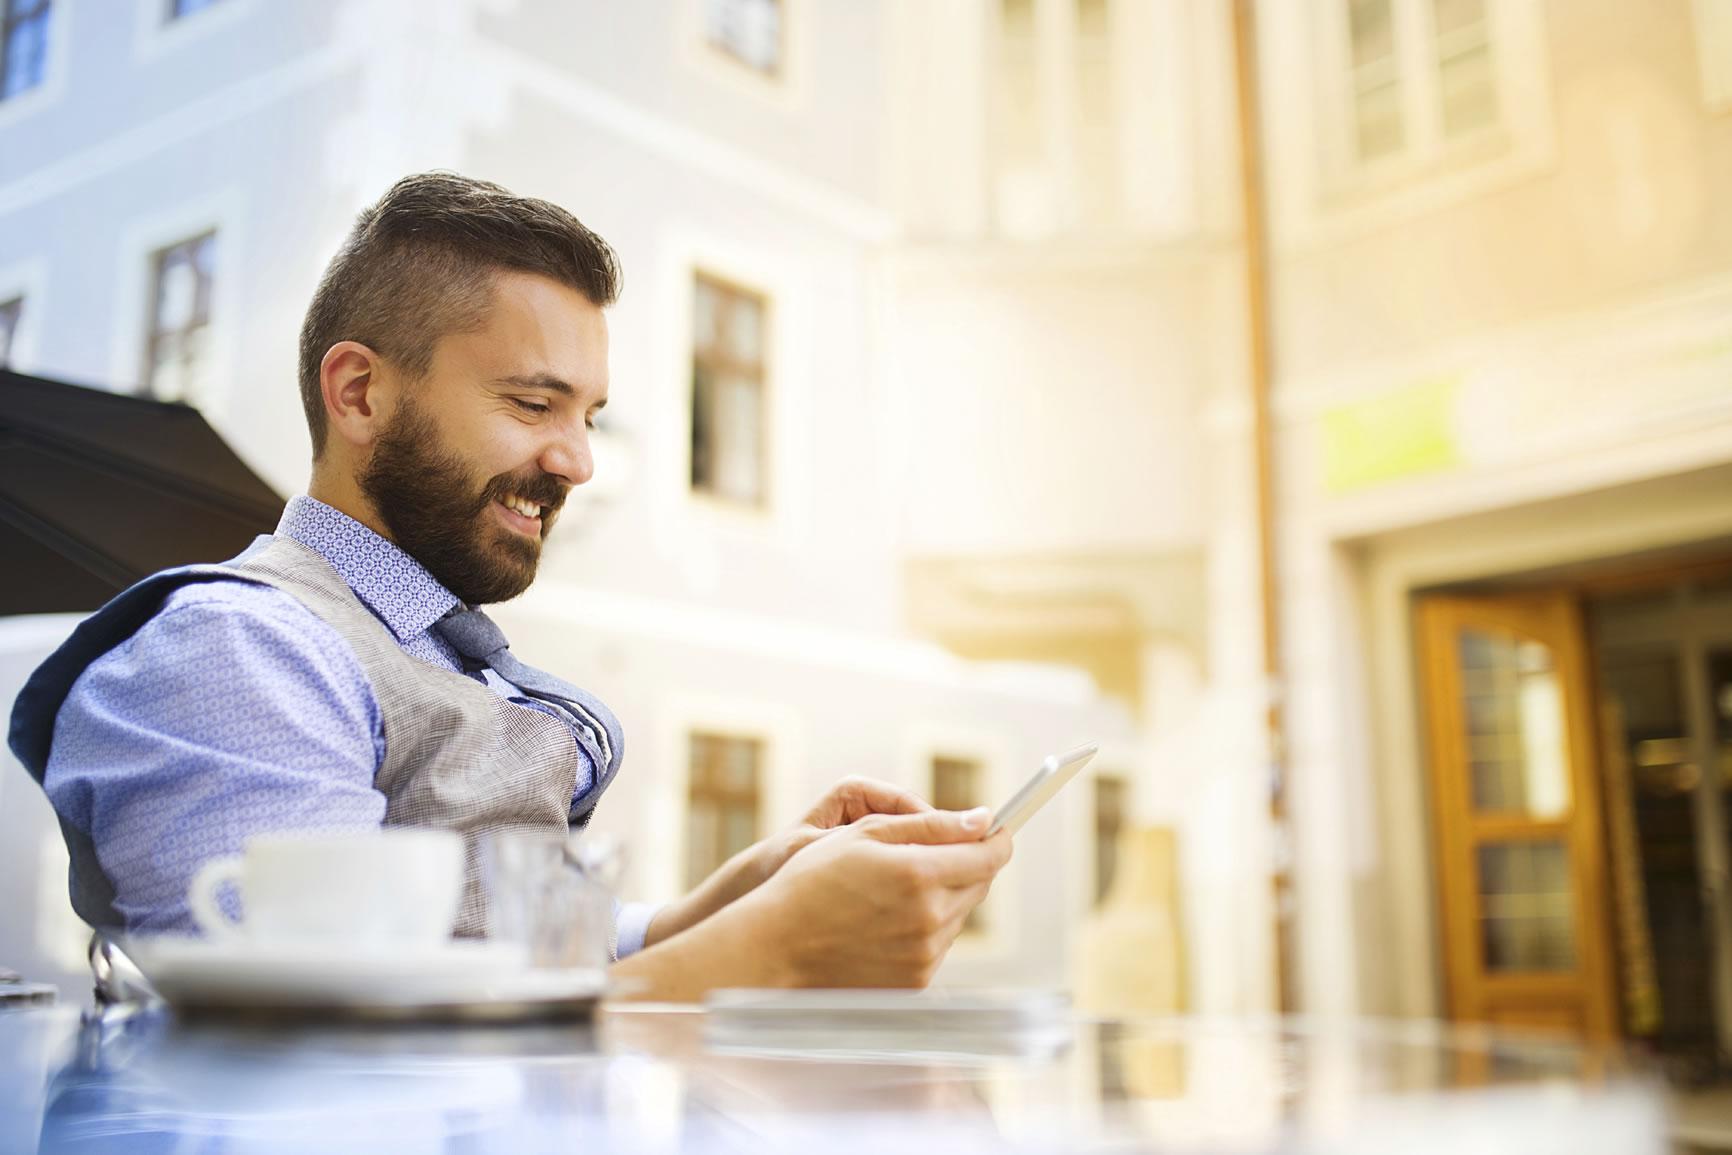 HotSpot WiFi per aziende e uffici